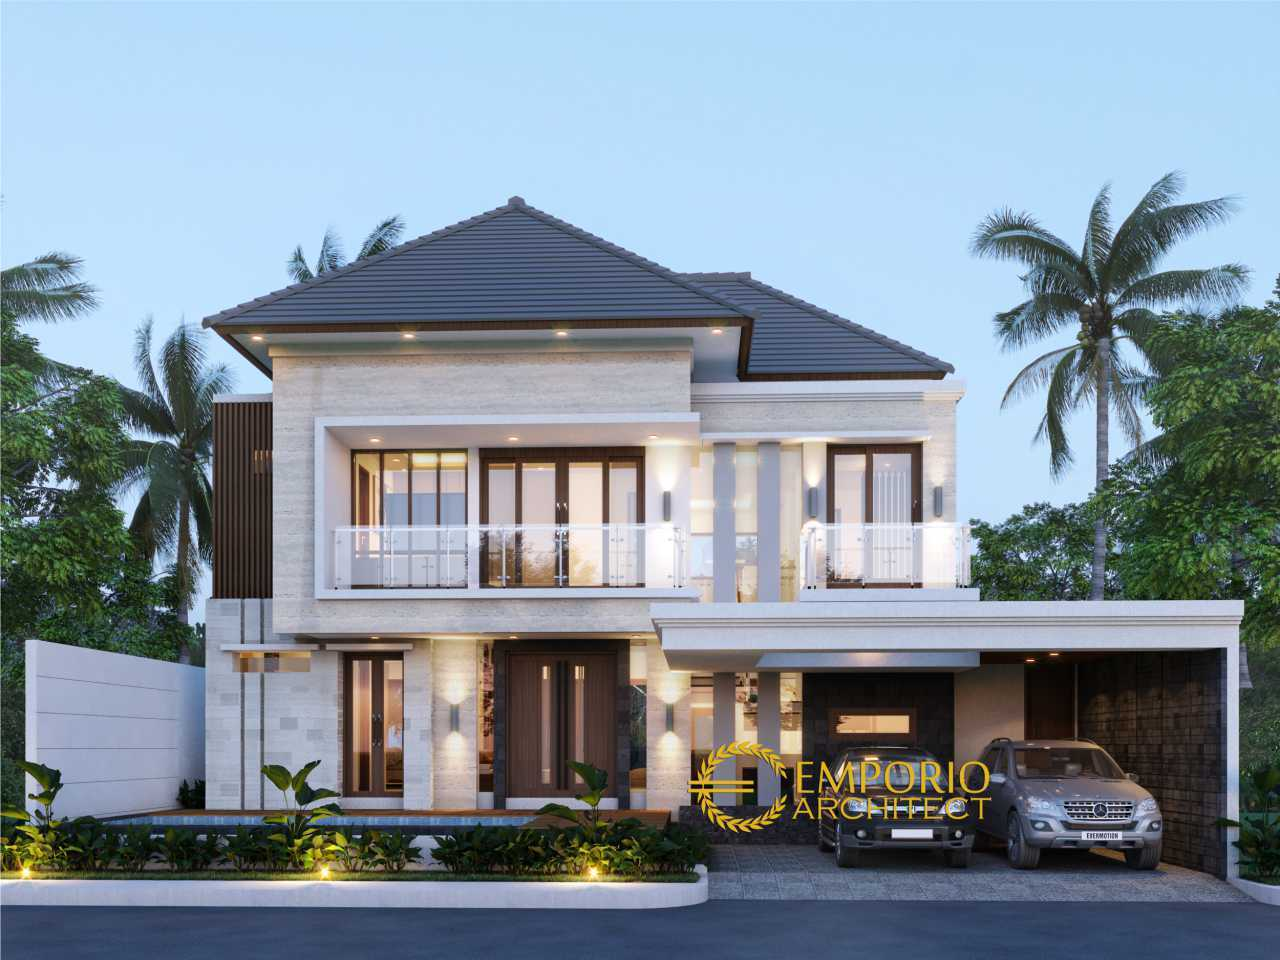 Emporio Architect Jasa Arsitek Denpasar Desain Rumah Modern 2 Lantai 774 @ Denpasar, Bali Kota Denpasar, Bali, Indonesia Kota Denpasar, Bali, Indonesia Emporio-Architect-Jasa-Arsitek-Denpasar-Desain-Rumah-Modern-2-Lantai-774-Denpasar-Bali Modern 88260